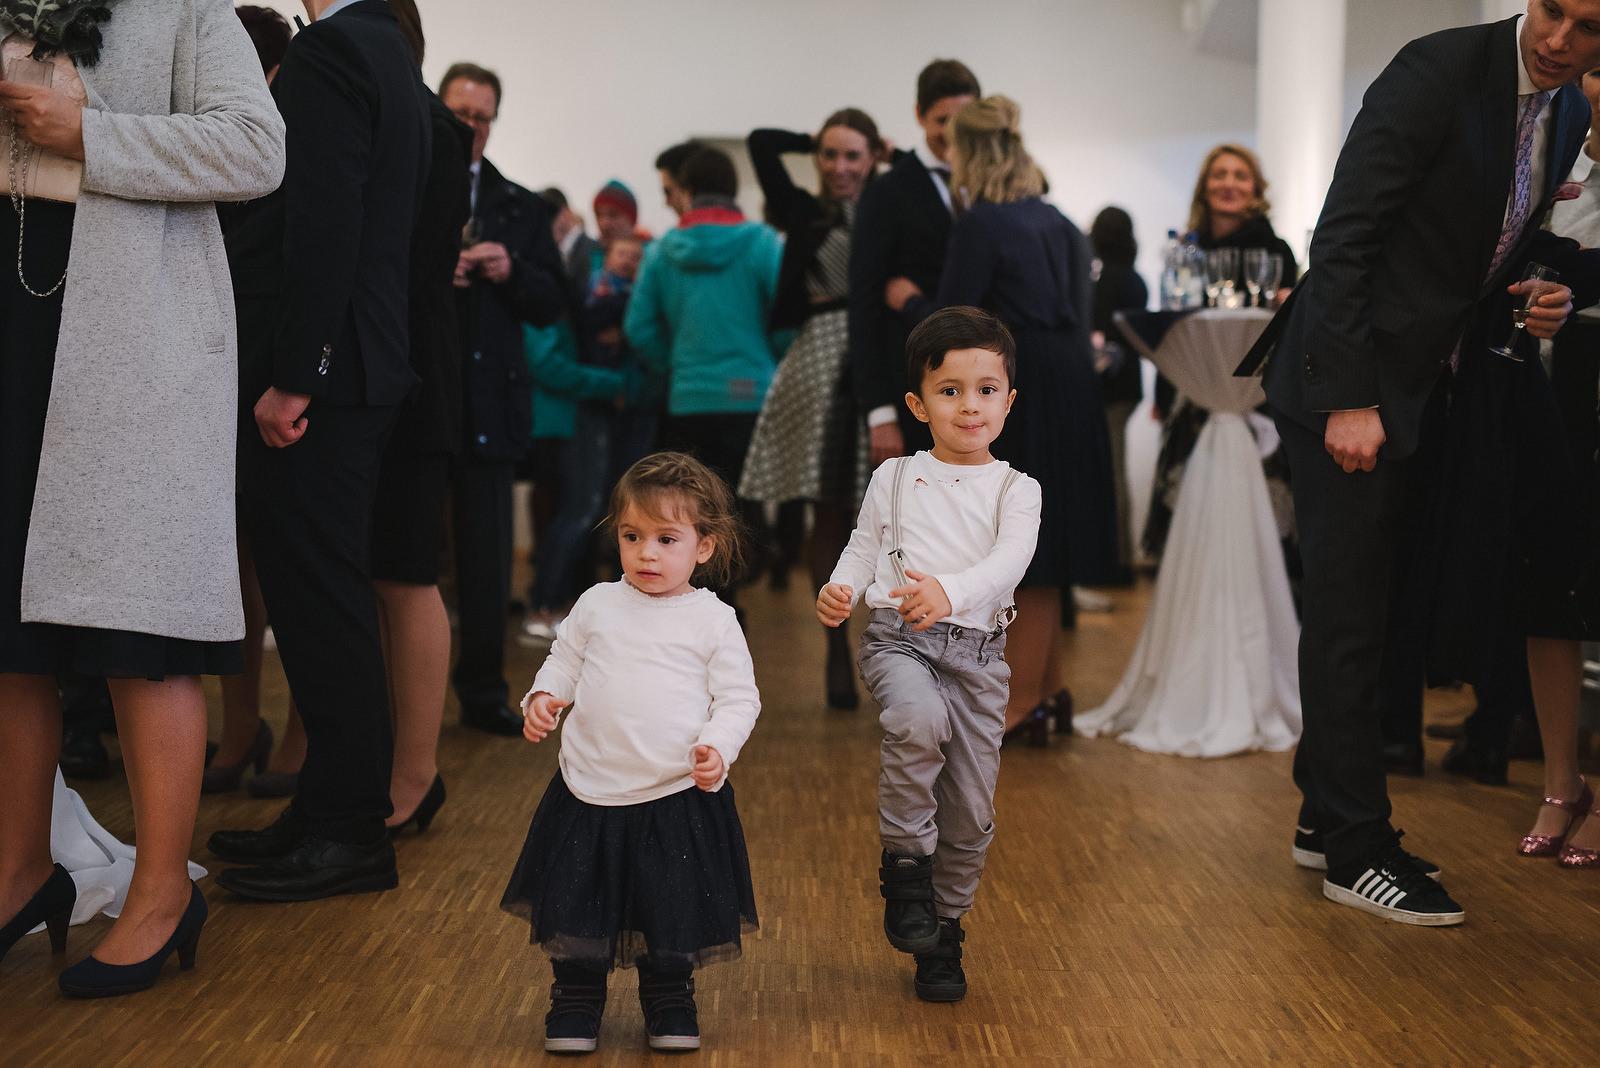 Fotograf Konstanz - Silvester Wedding in Hagnau / Friedrichshafen at Lake of Constance  - 35 -